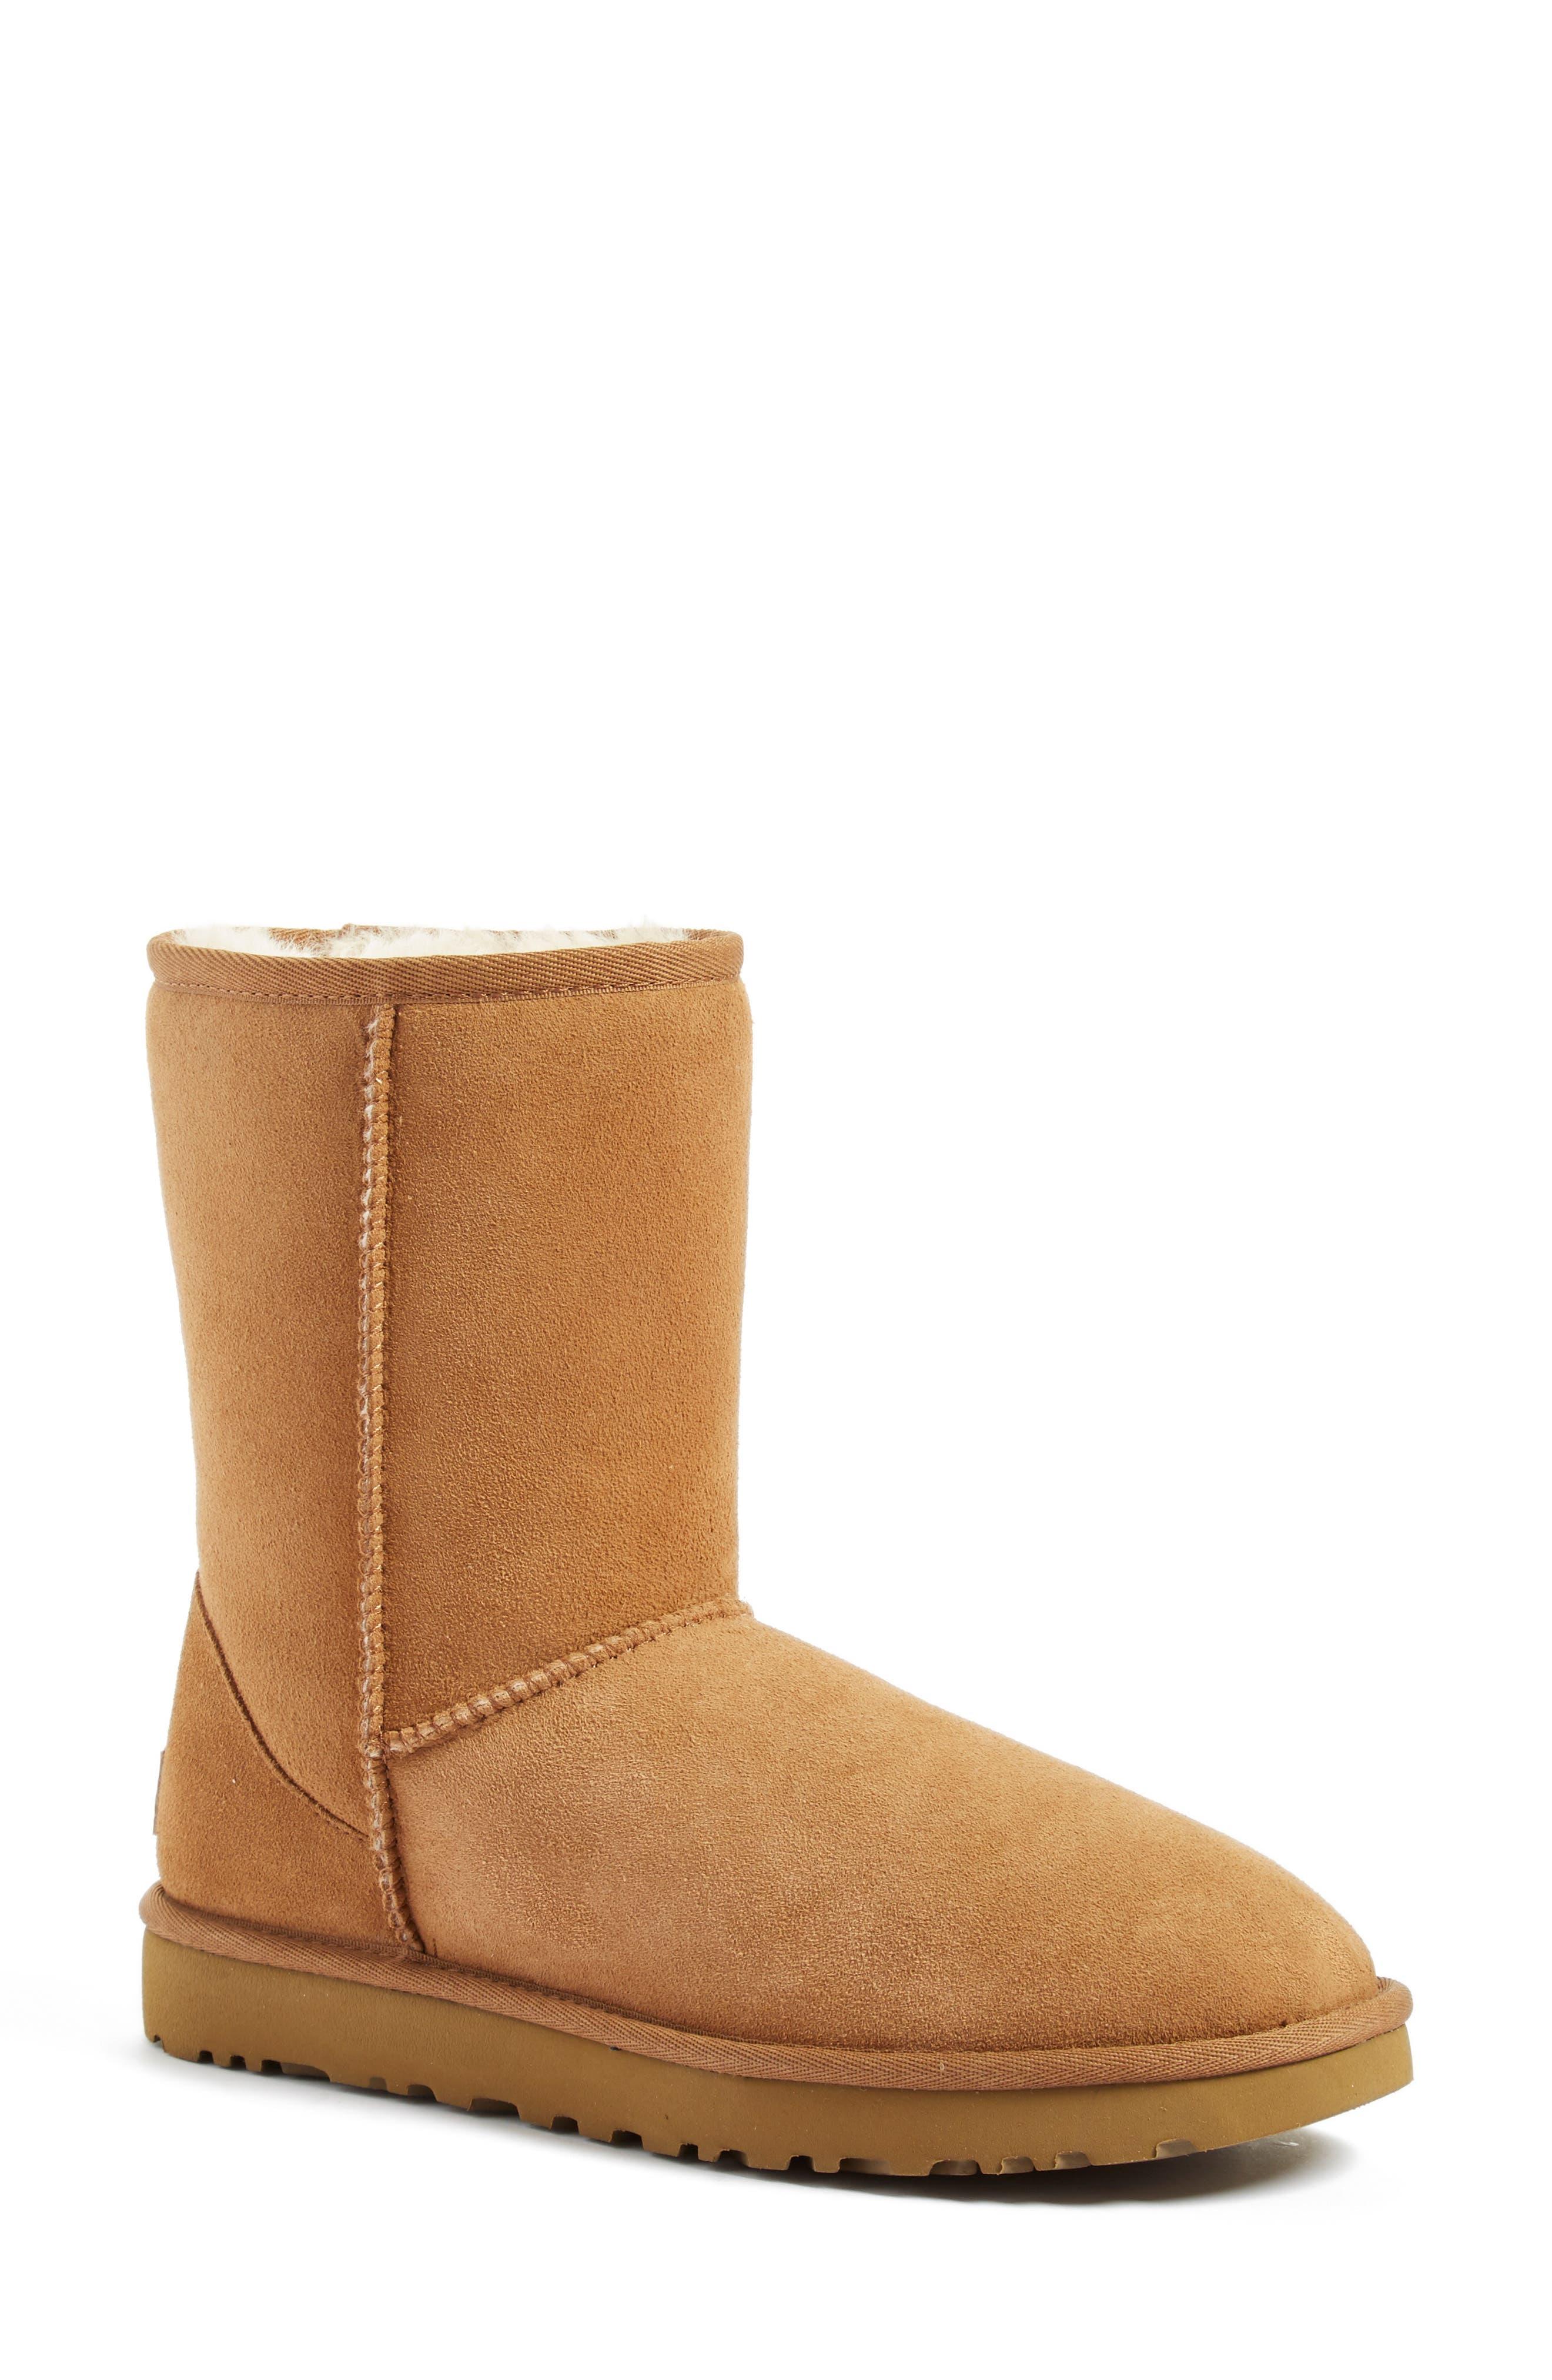 ugg classic ii genuine shearling lined short boot women nordstrom rh shop nordstrom com